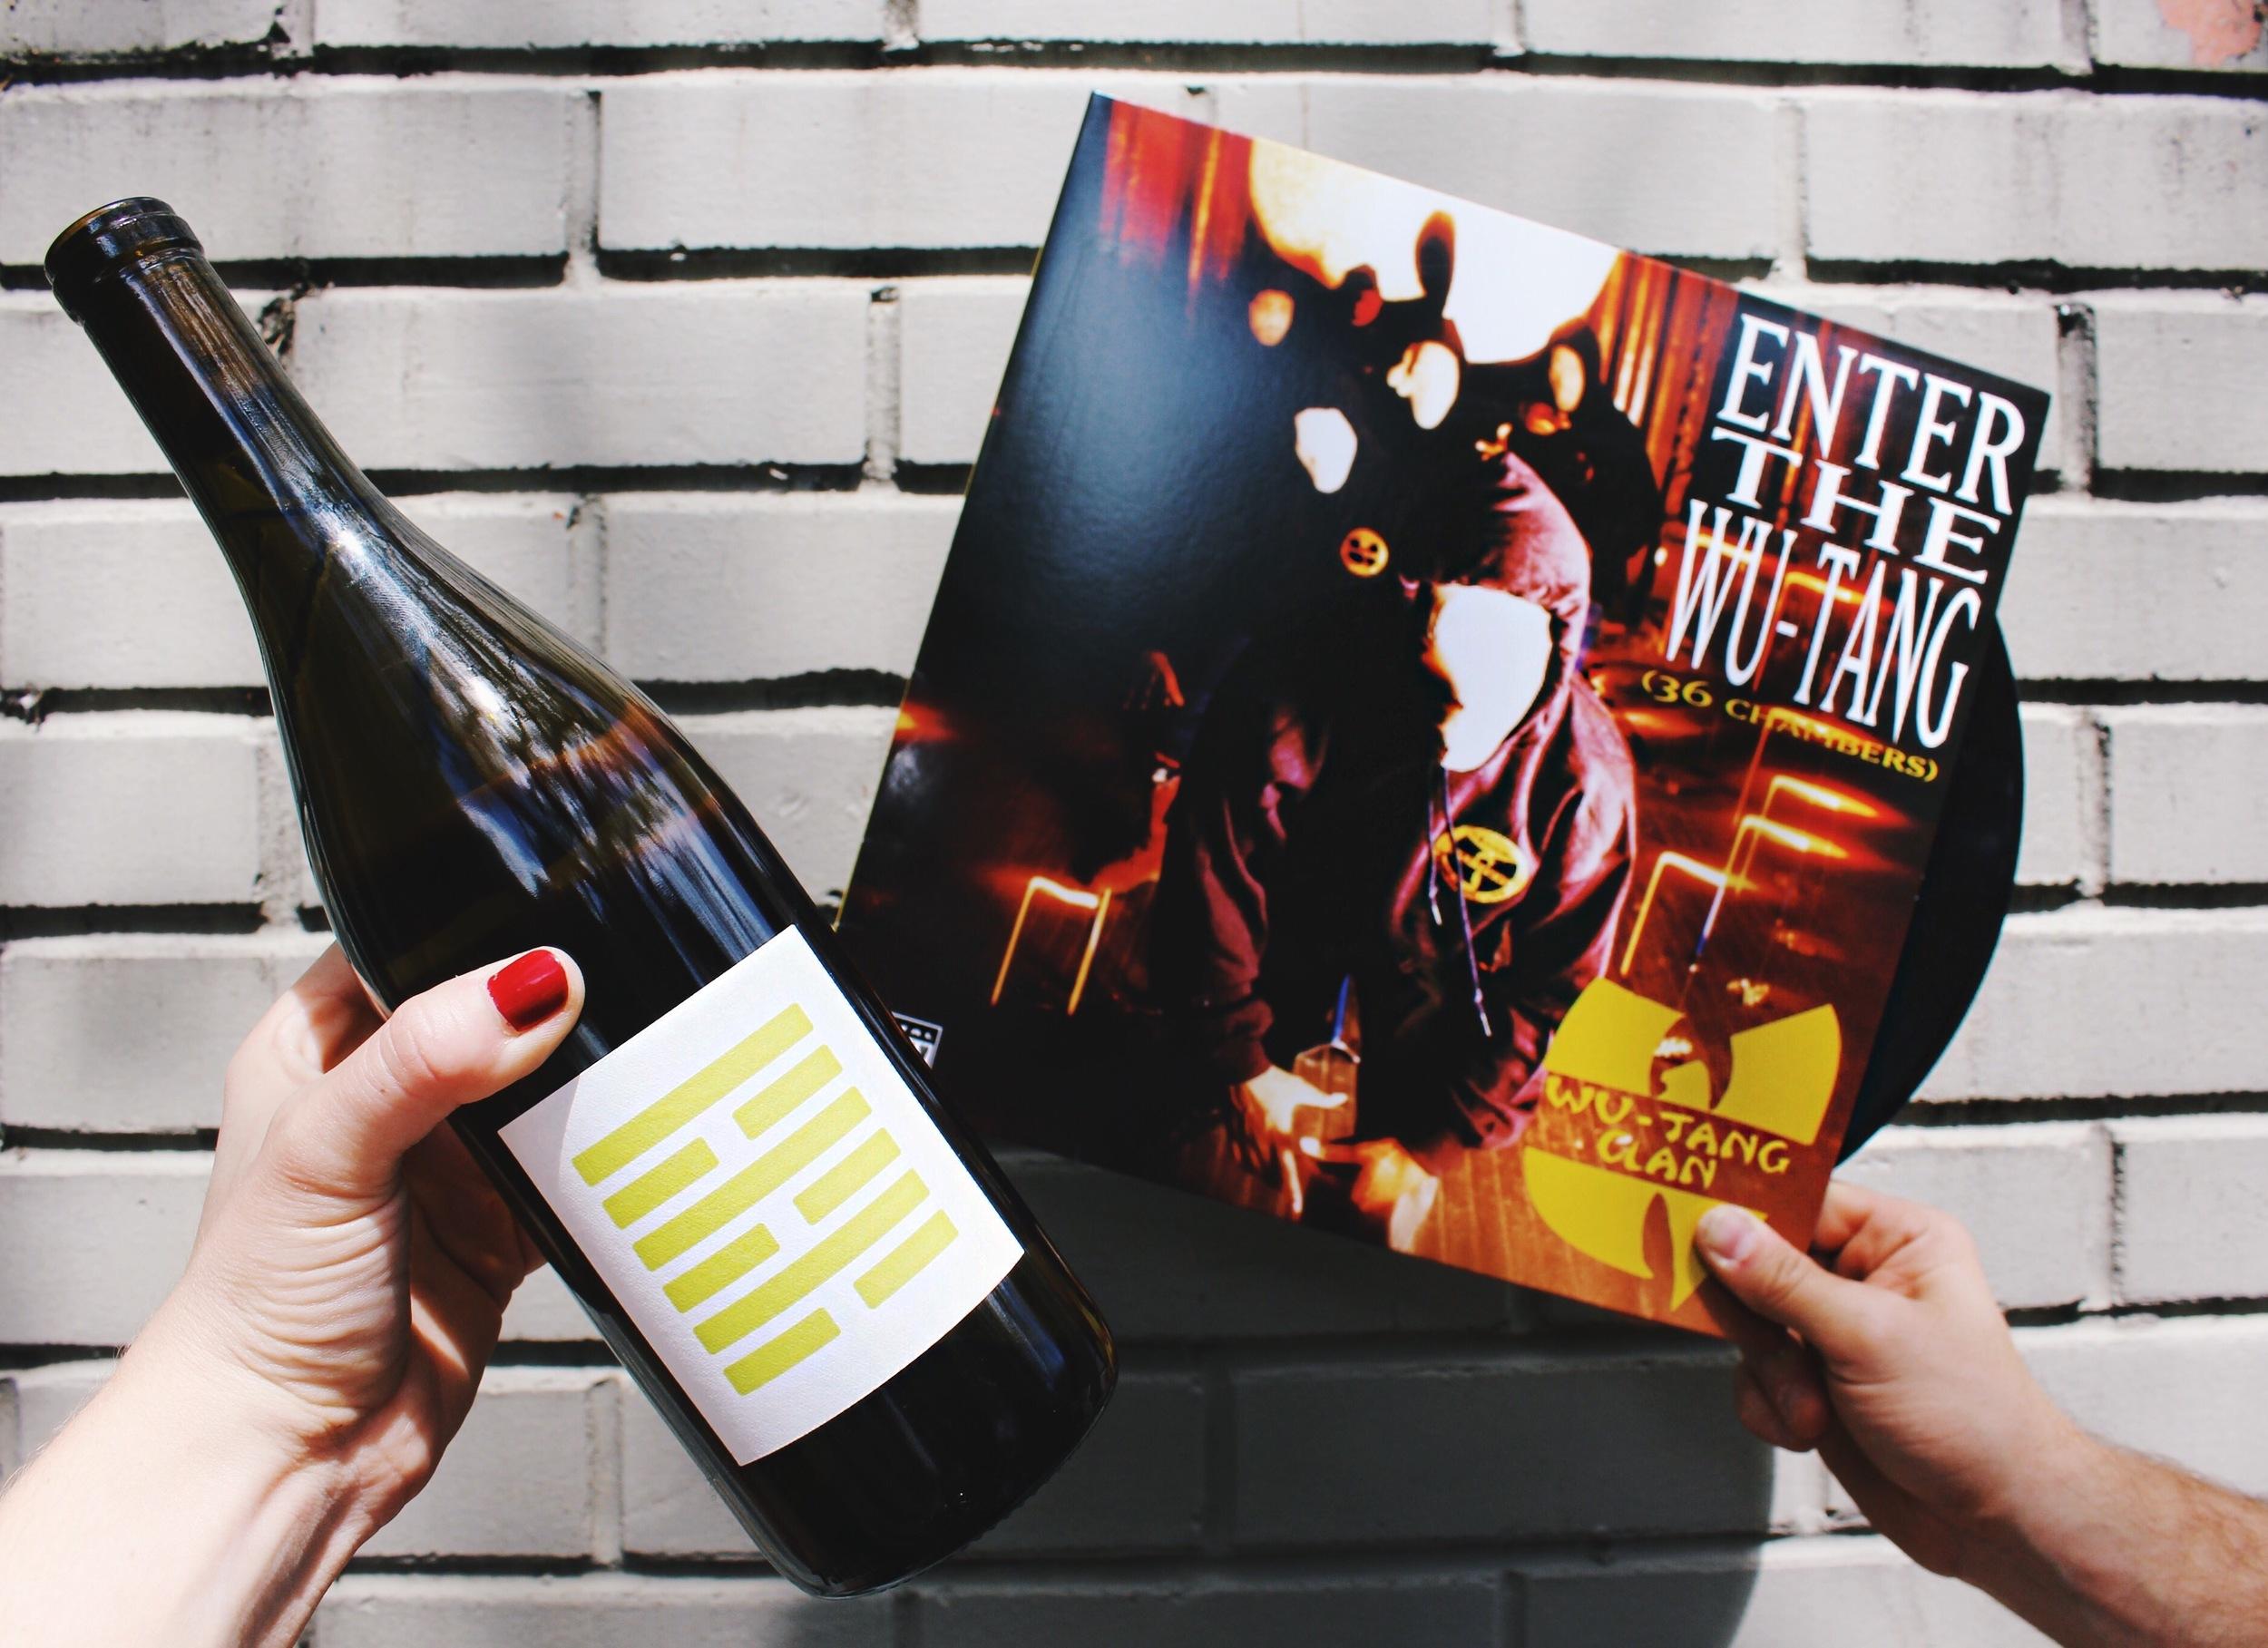 Wu-Tang and Wine